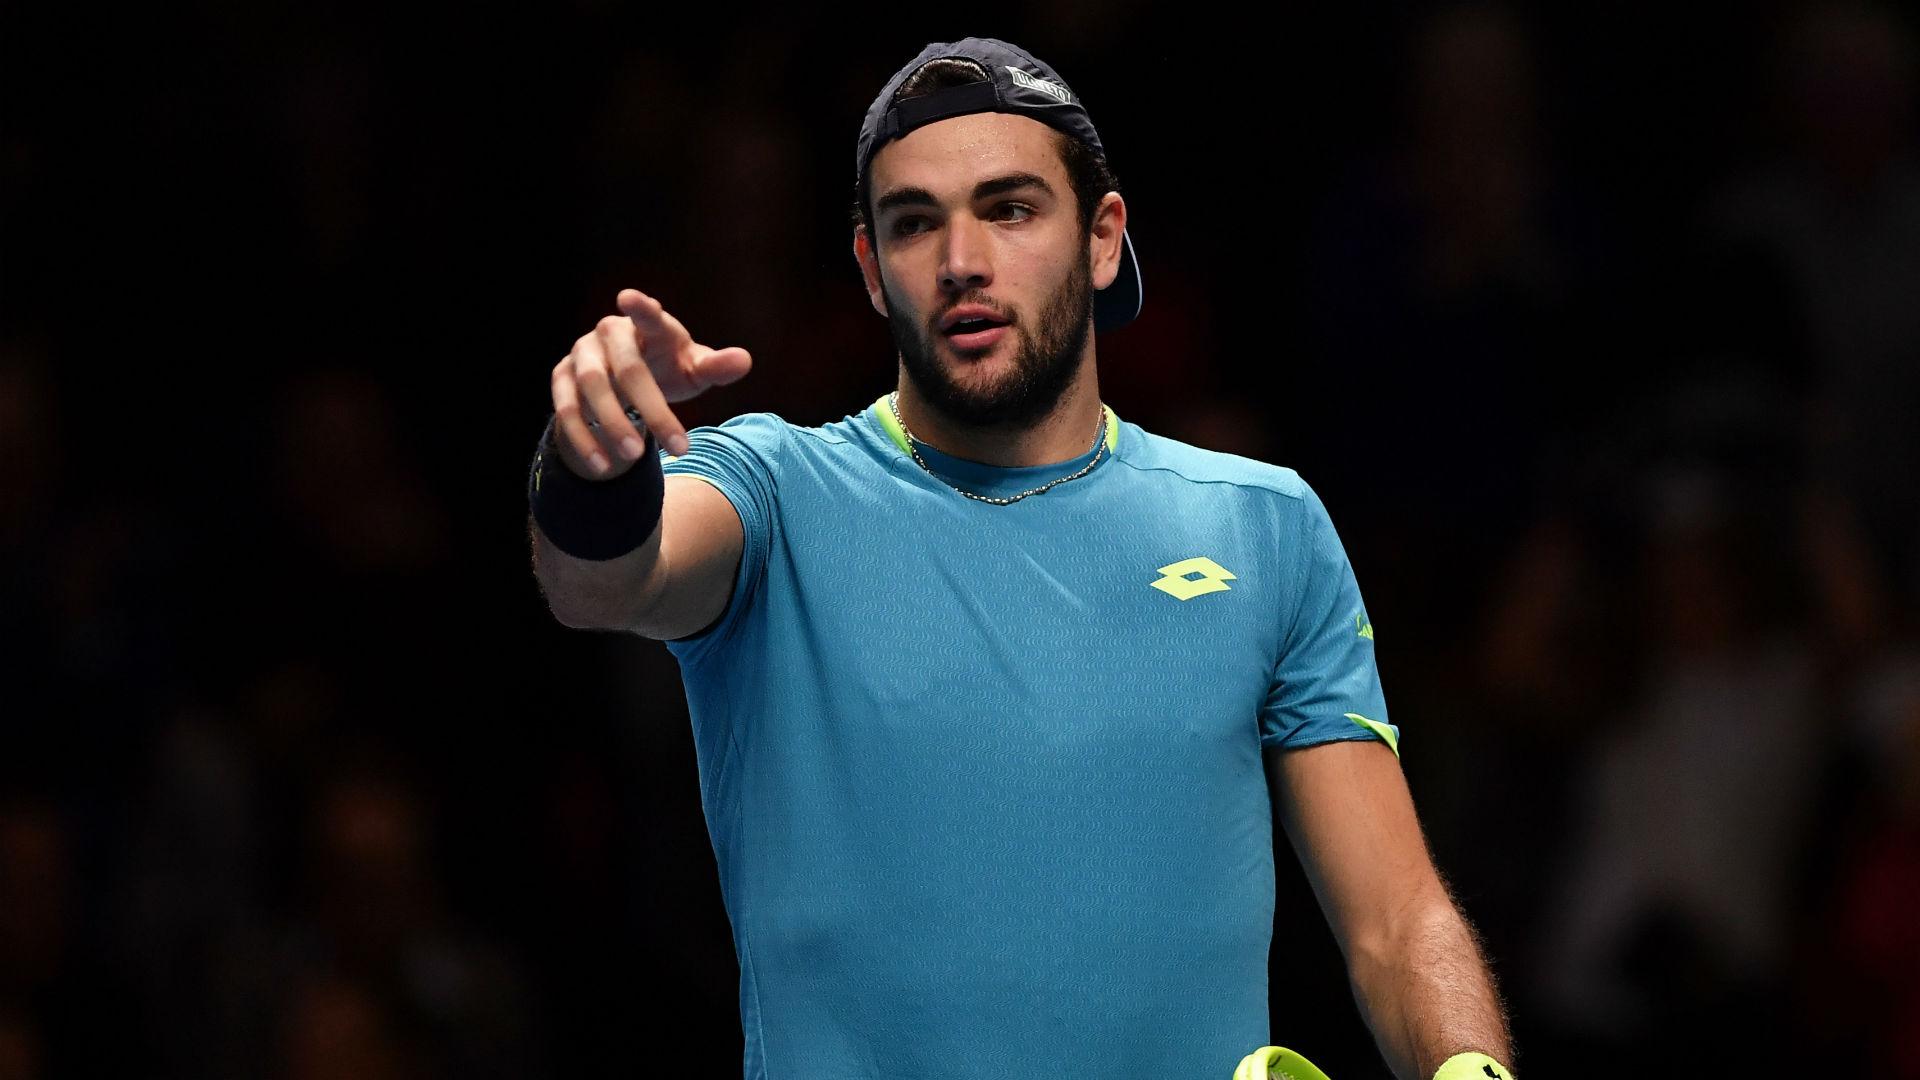 Matteo Berrettini will play the Ultimate Tennis SHowdown